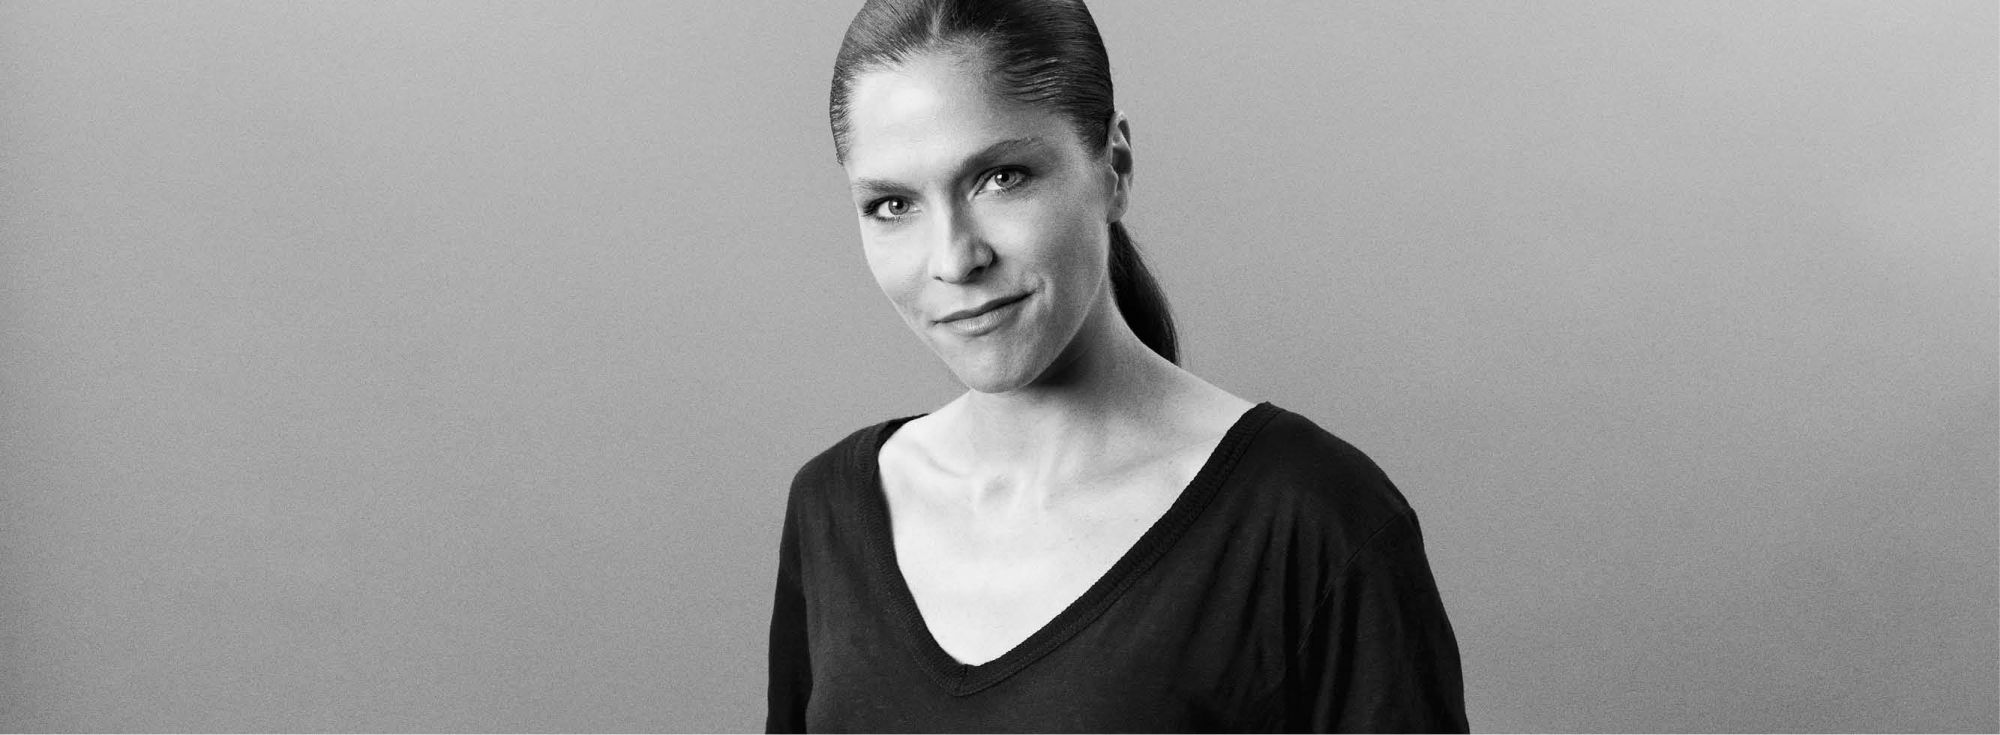 Mac Cosmetics' Director of Global Makeup Artistry Lyne Desnoyers Reveal The Best Ways To Wear This Season's Runway Beauty Trends